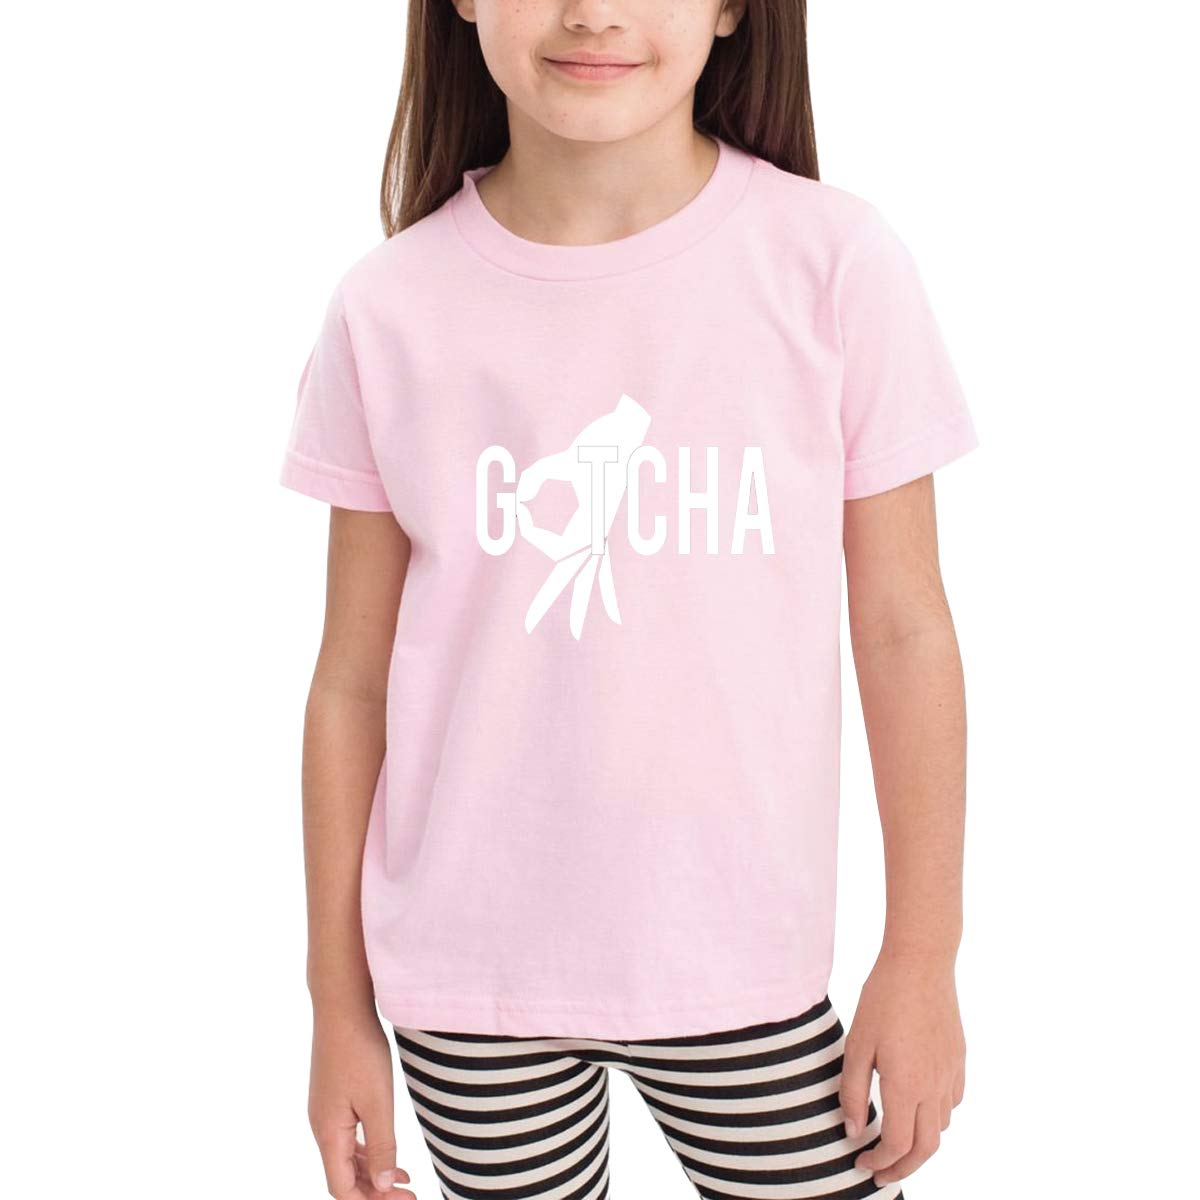 Gotcha Finger Unisex Youths Short Sleeve T-Shirt Kids T-Shirt Tops Black